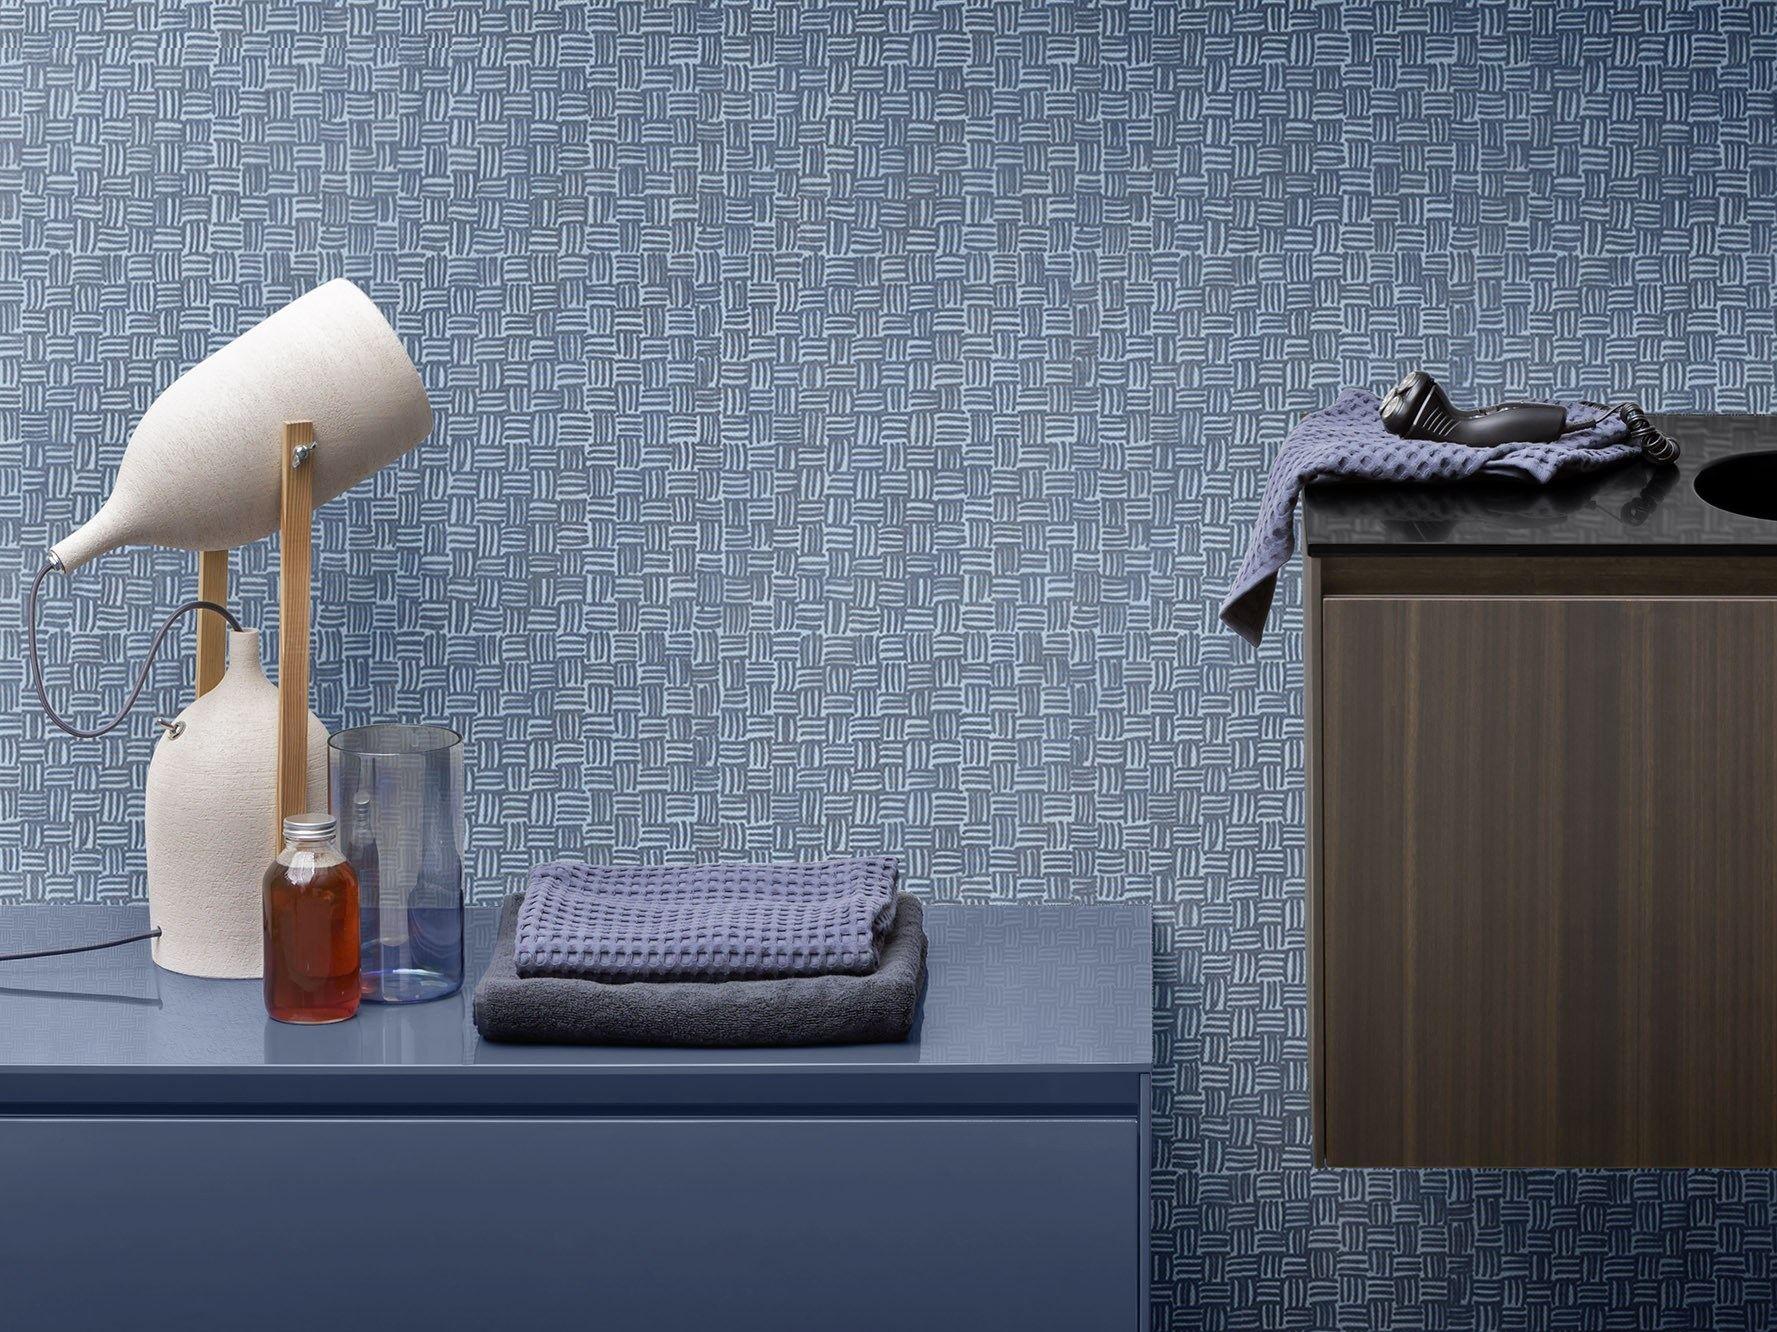 fibra | tapeterexa design